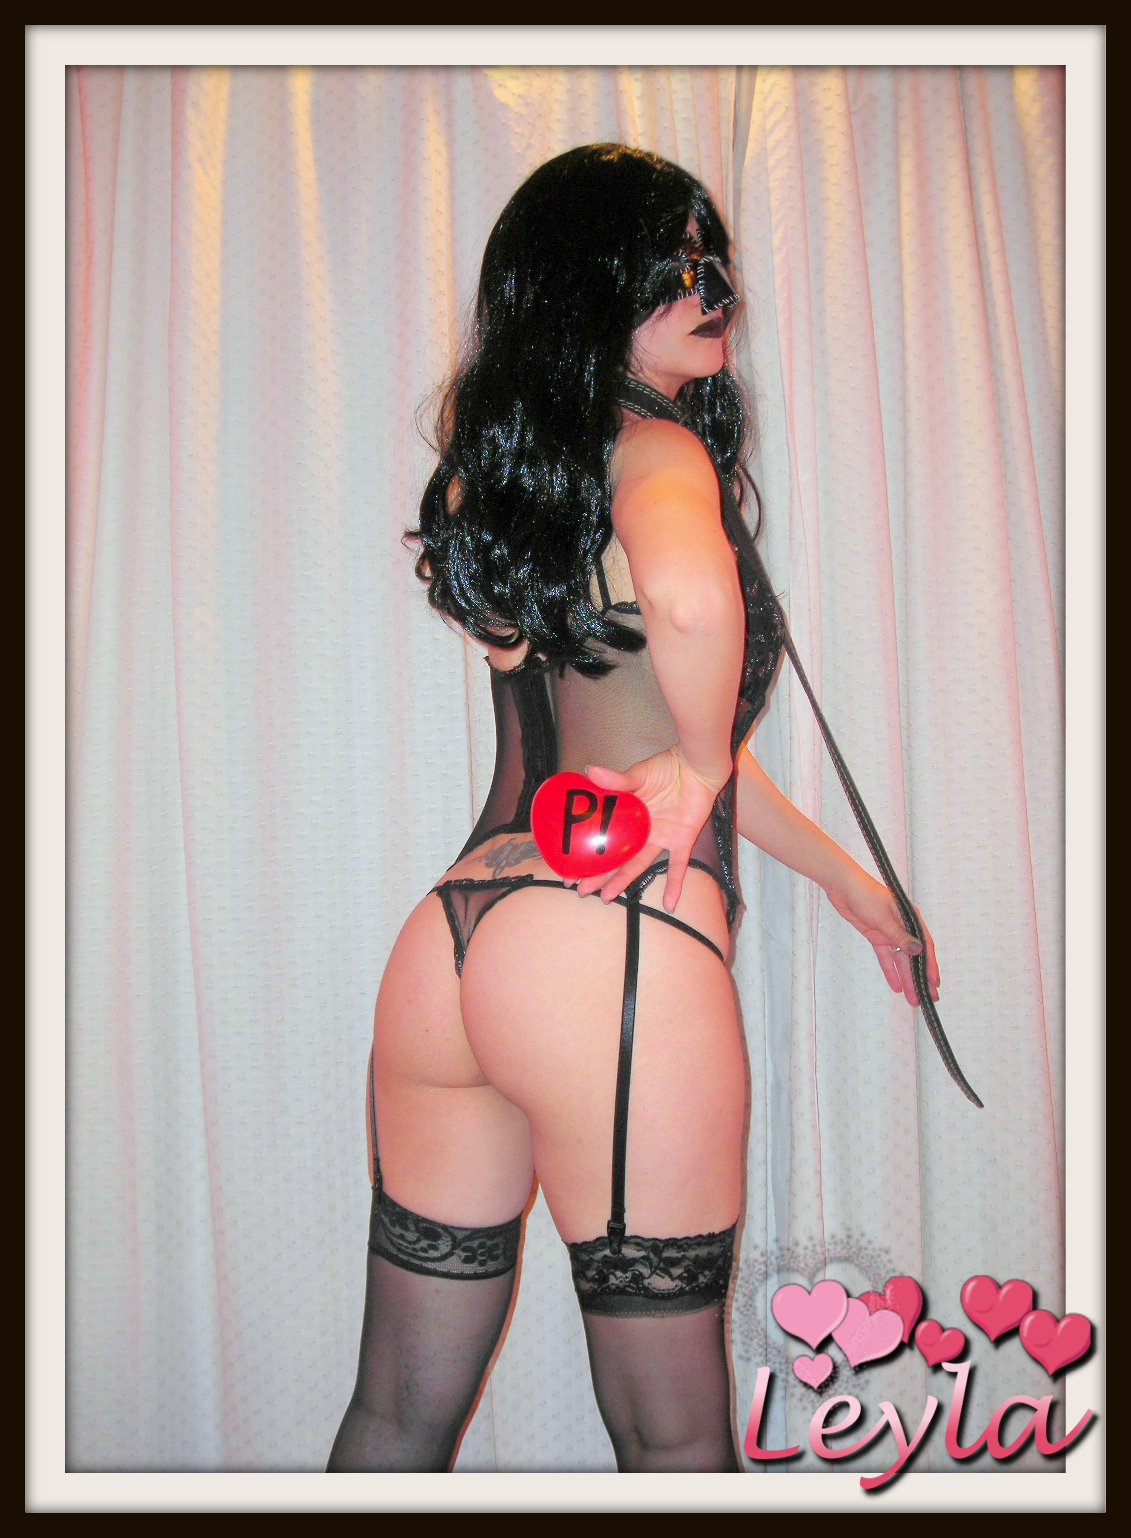 Leyla cubierta en lactancia erótica.. BDSM + gifs + video